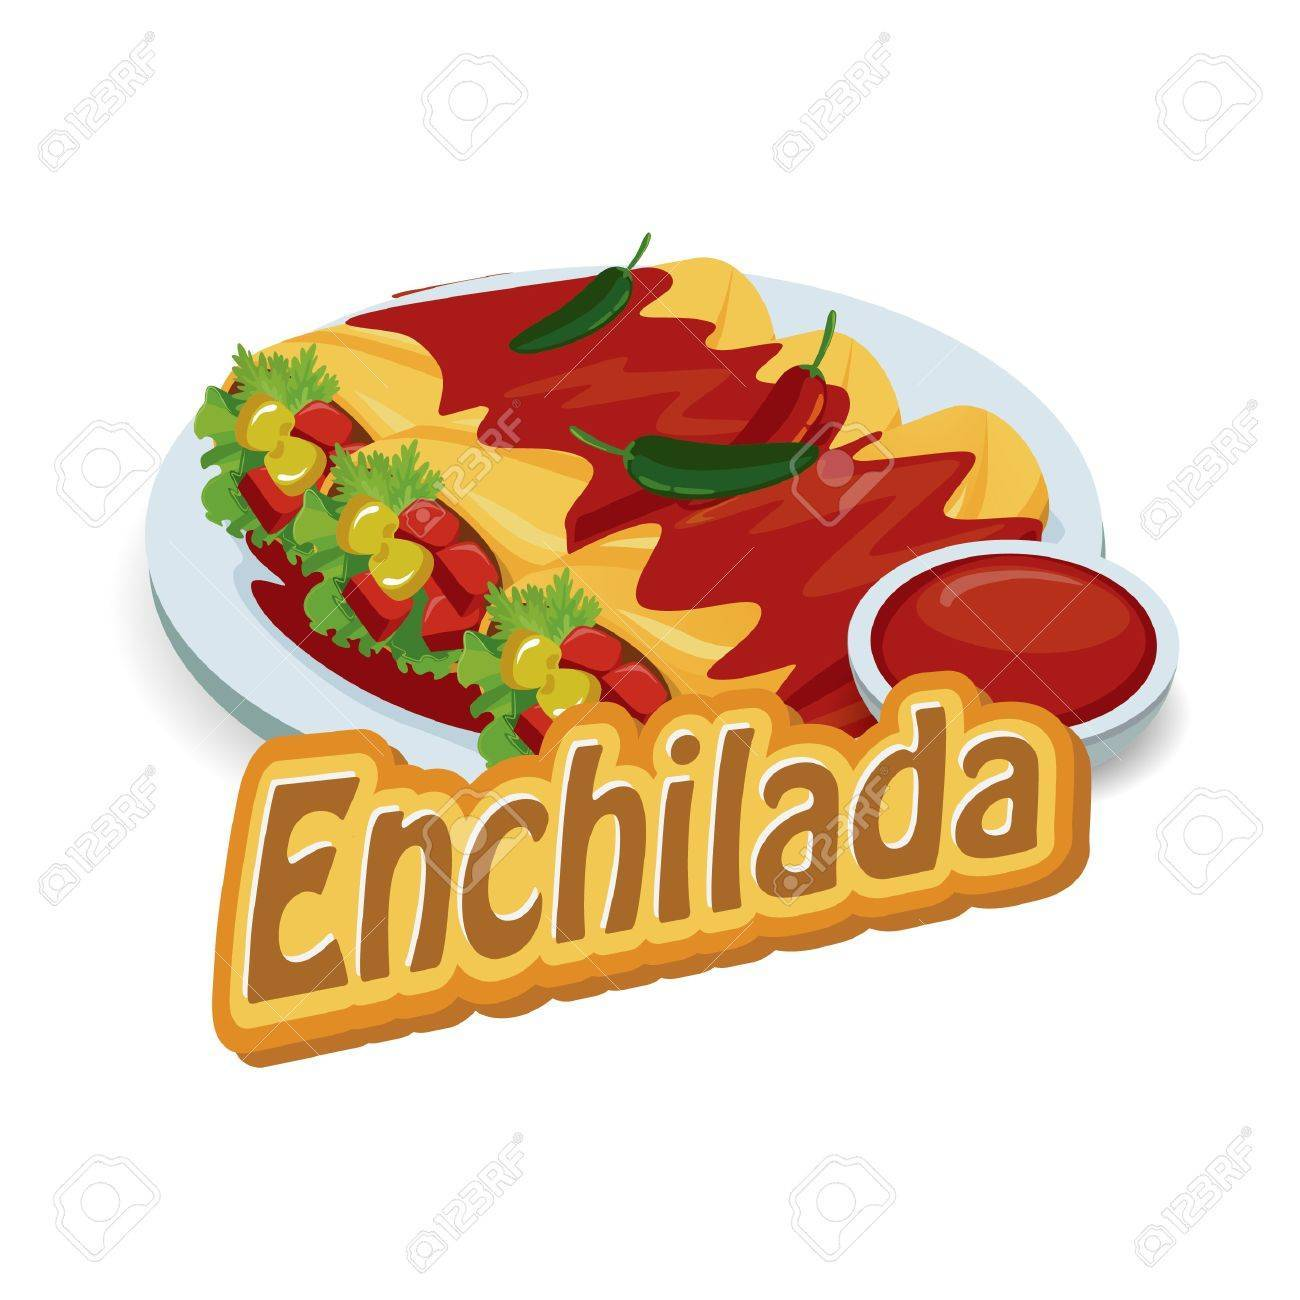 Enchilada clipart 8 » Clipart Portal.